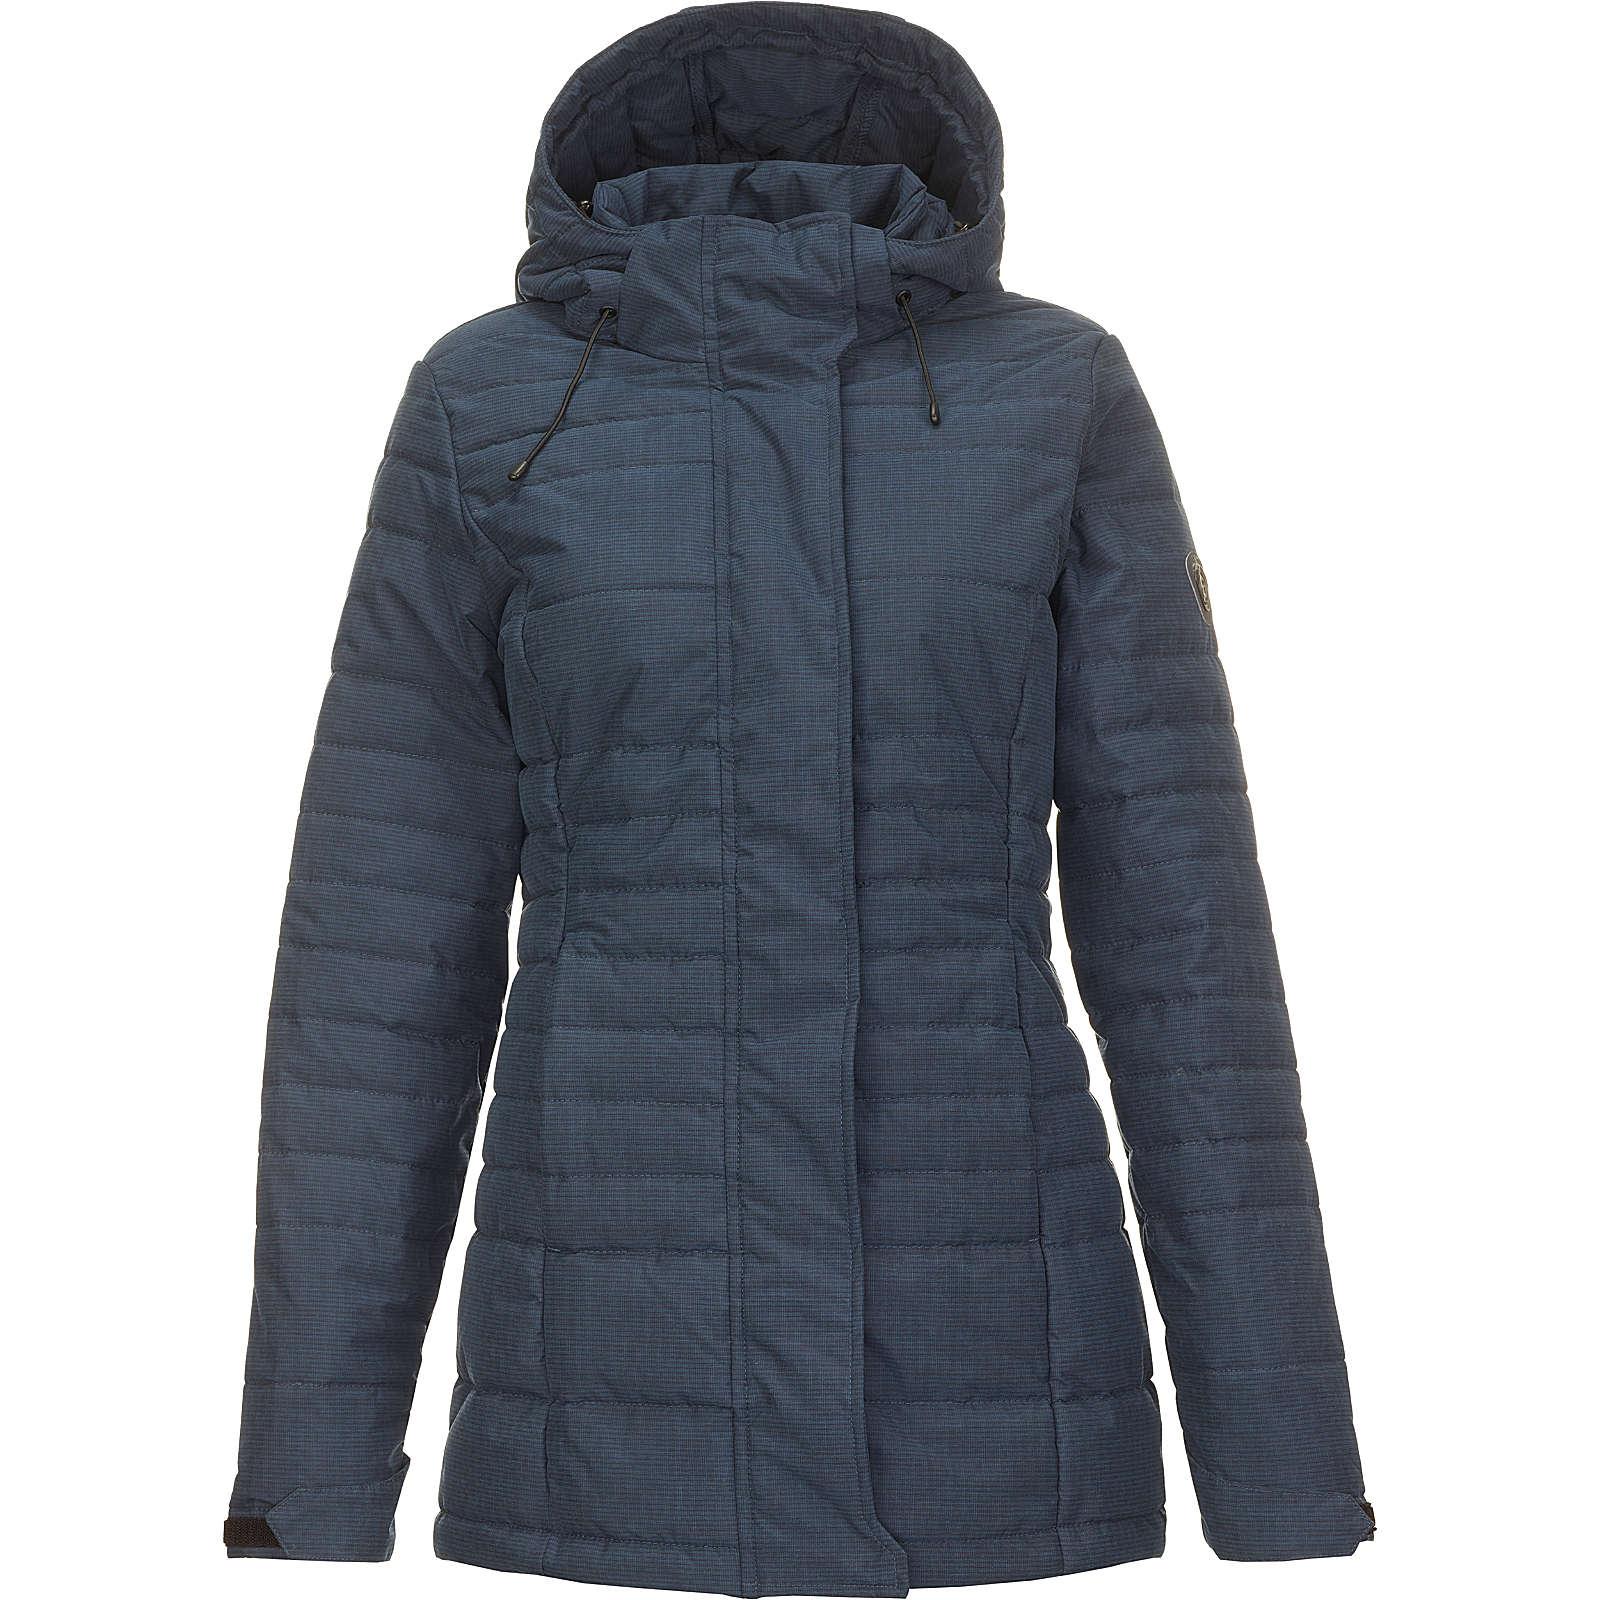 Rabatt-Preisvergleich.de - Bekleidung   Jacken   Winterjacken 0ac10e2838